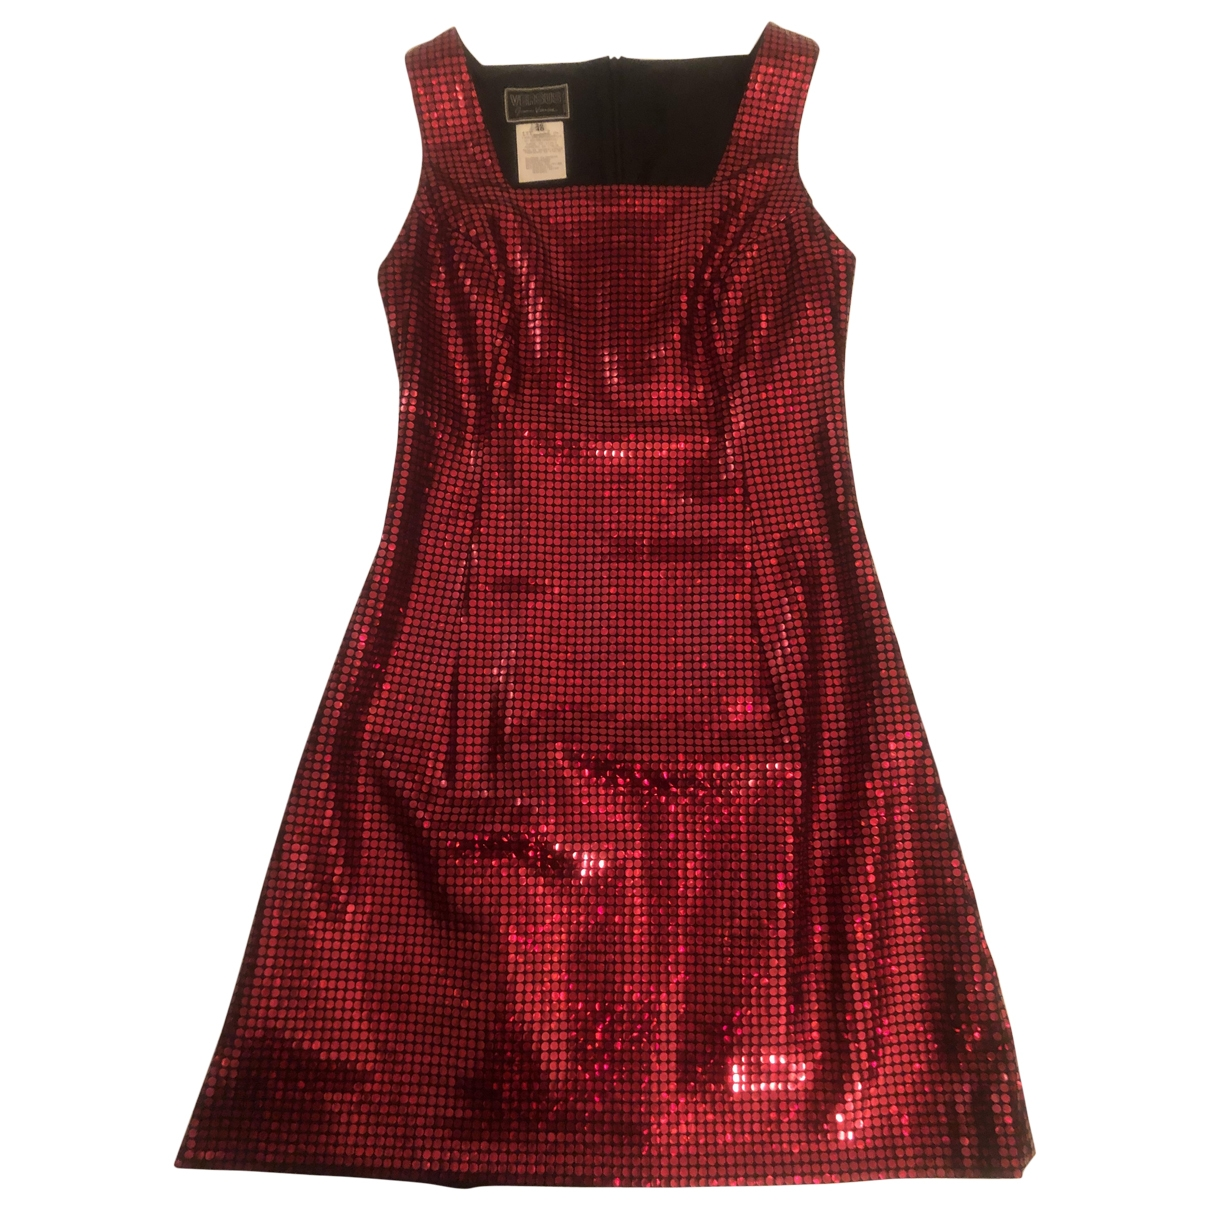 Versus \N Red dress for Women 40 IT